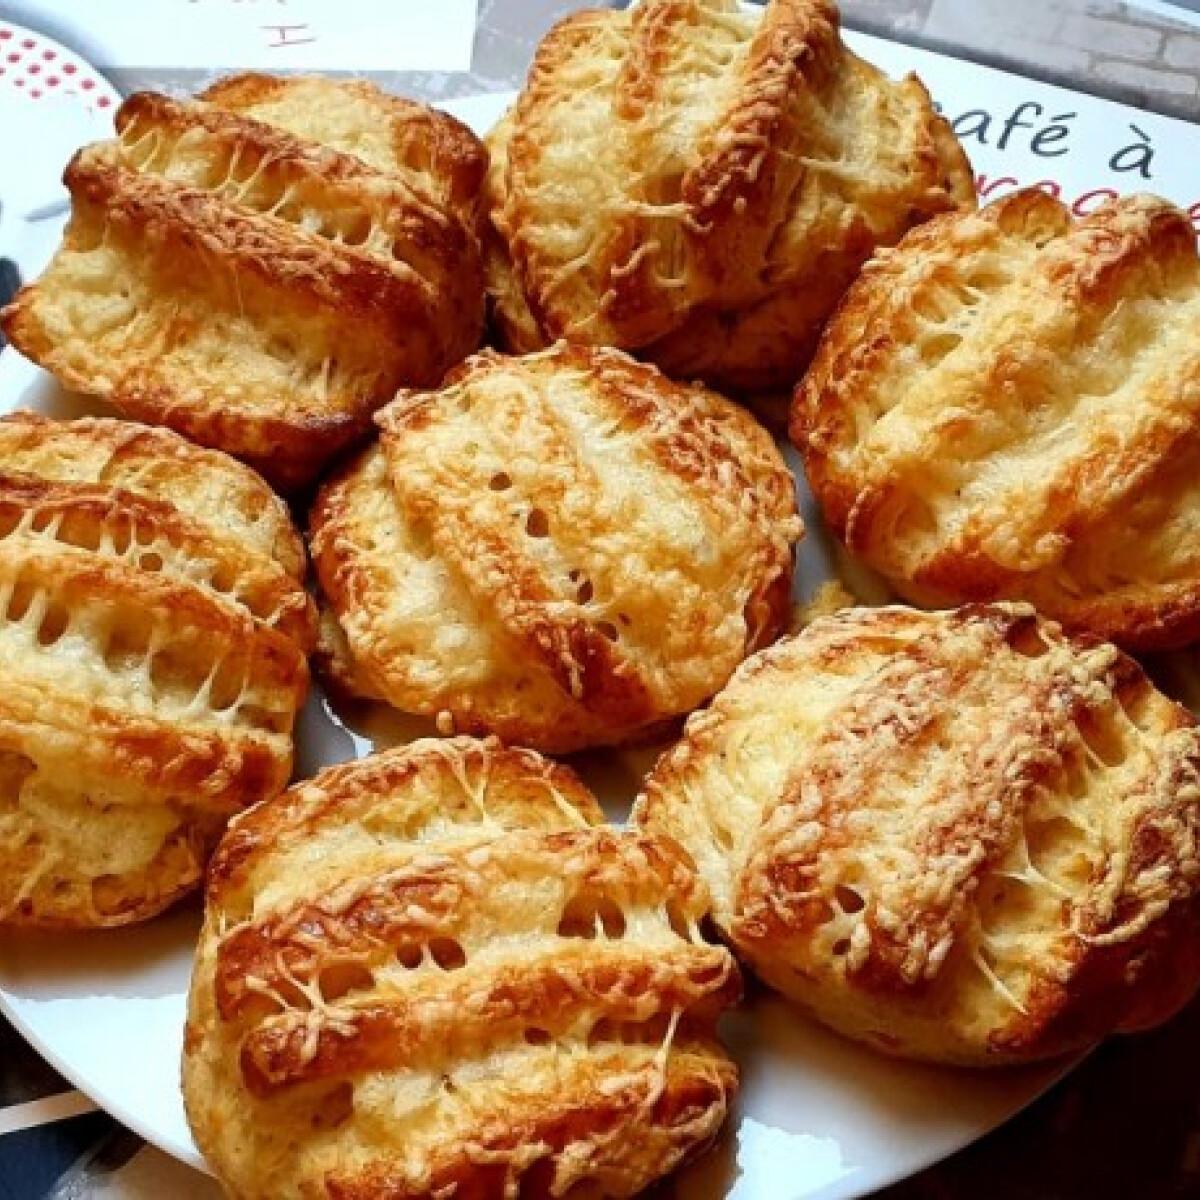 Isteni finom, omlós, sajtos pogácsa